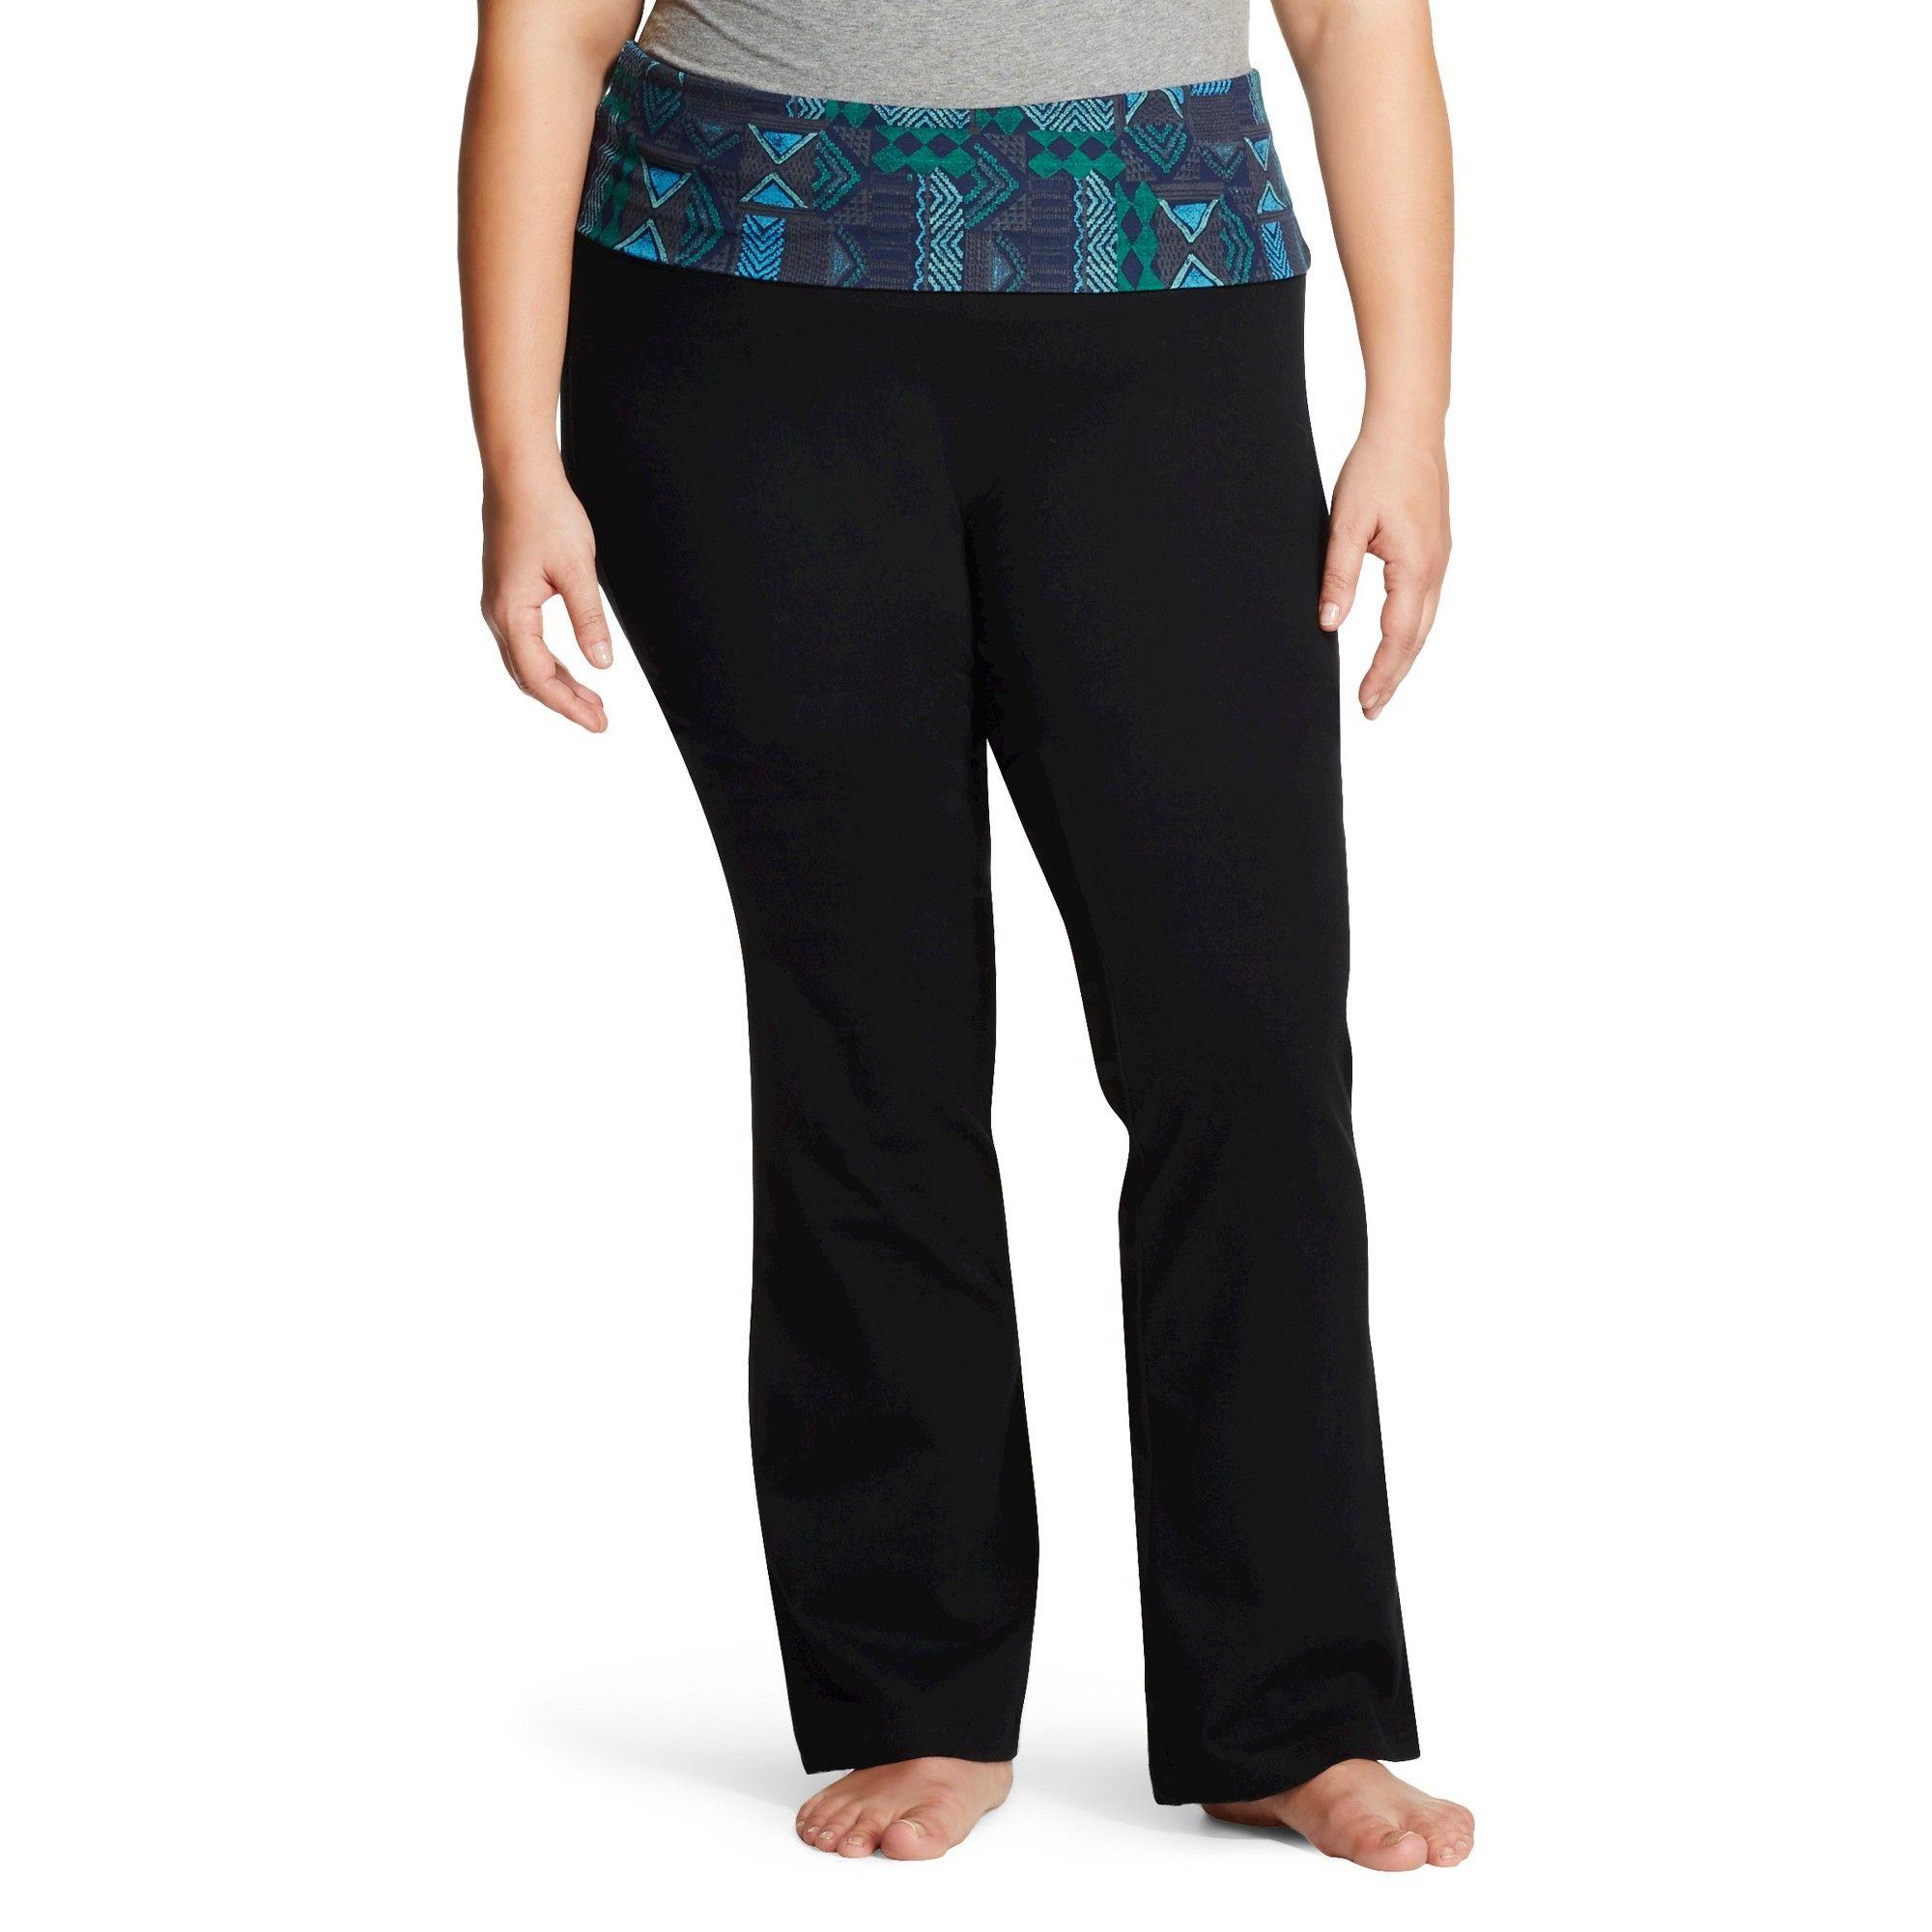 df9c4b7c5e097 Women's Plus Size Bootcut Yoga Pant Blue Tribal Print 4X - Mossimo Supply  Co.(Juniors')